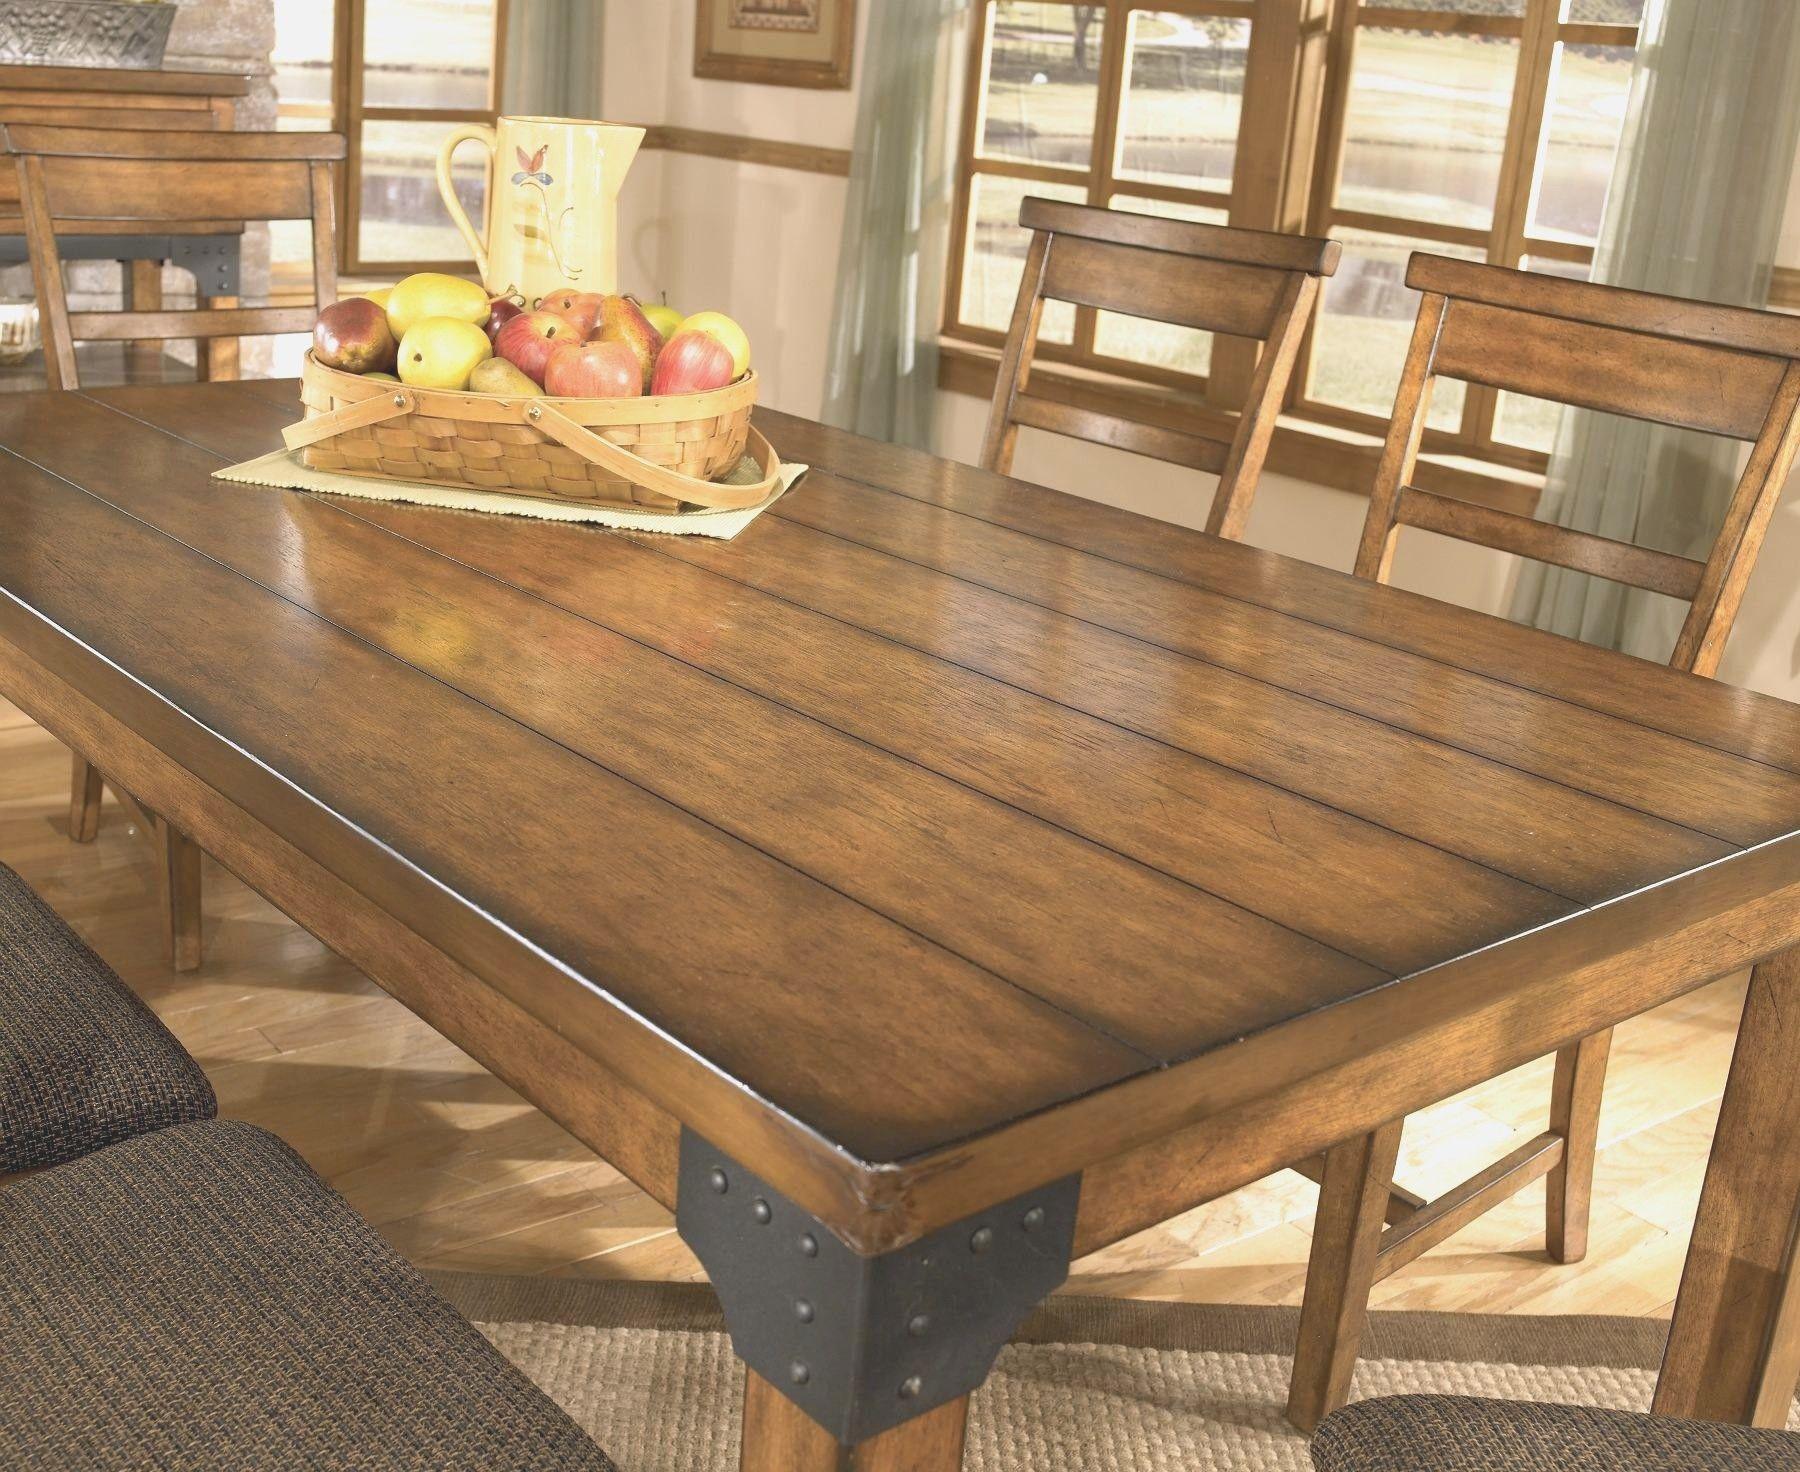 Build Your Own Kitchen Table Easy Diy Farmhouse Bench